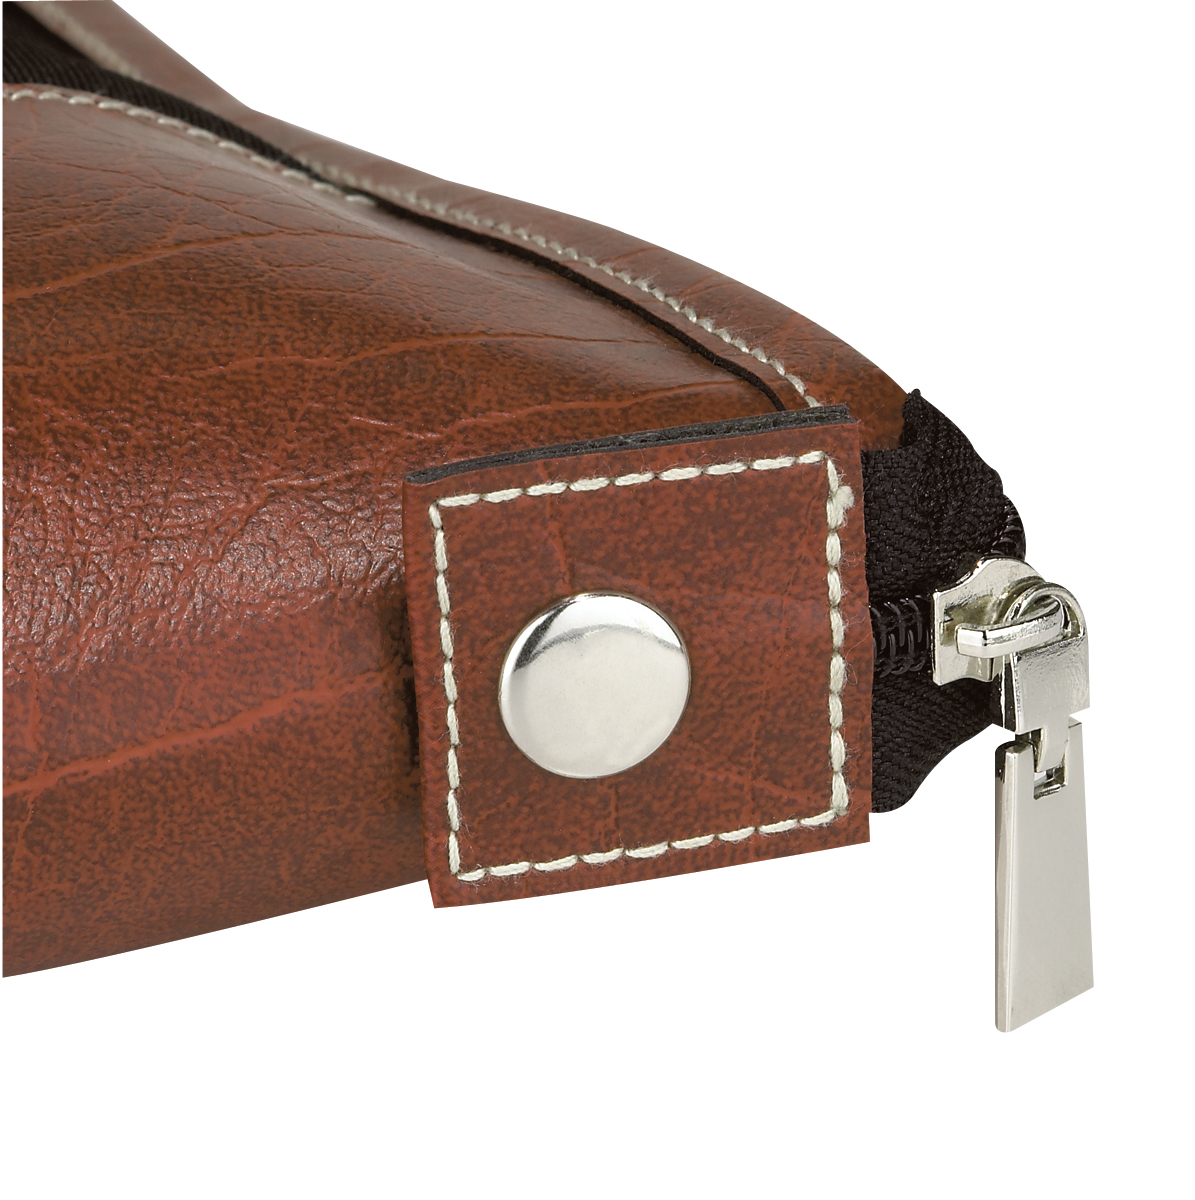 travel suit bag with brown leatherette trim u0026 interior pockets